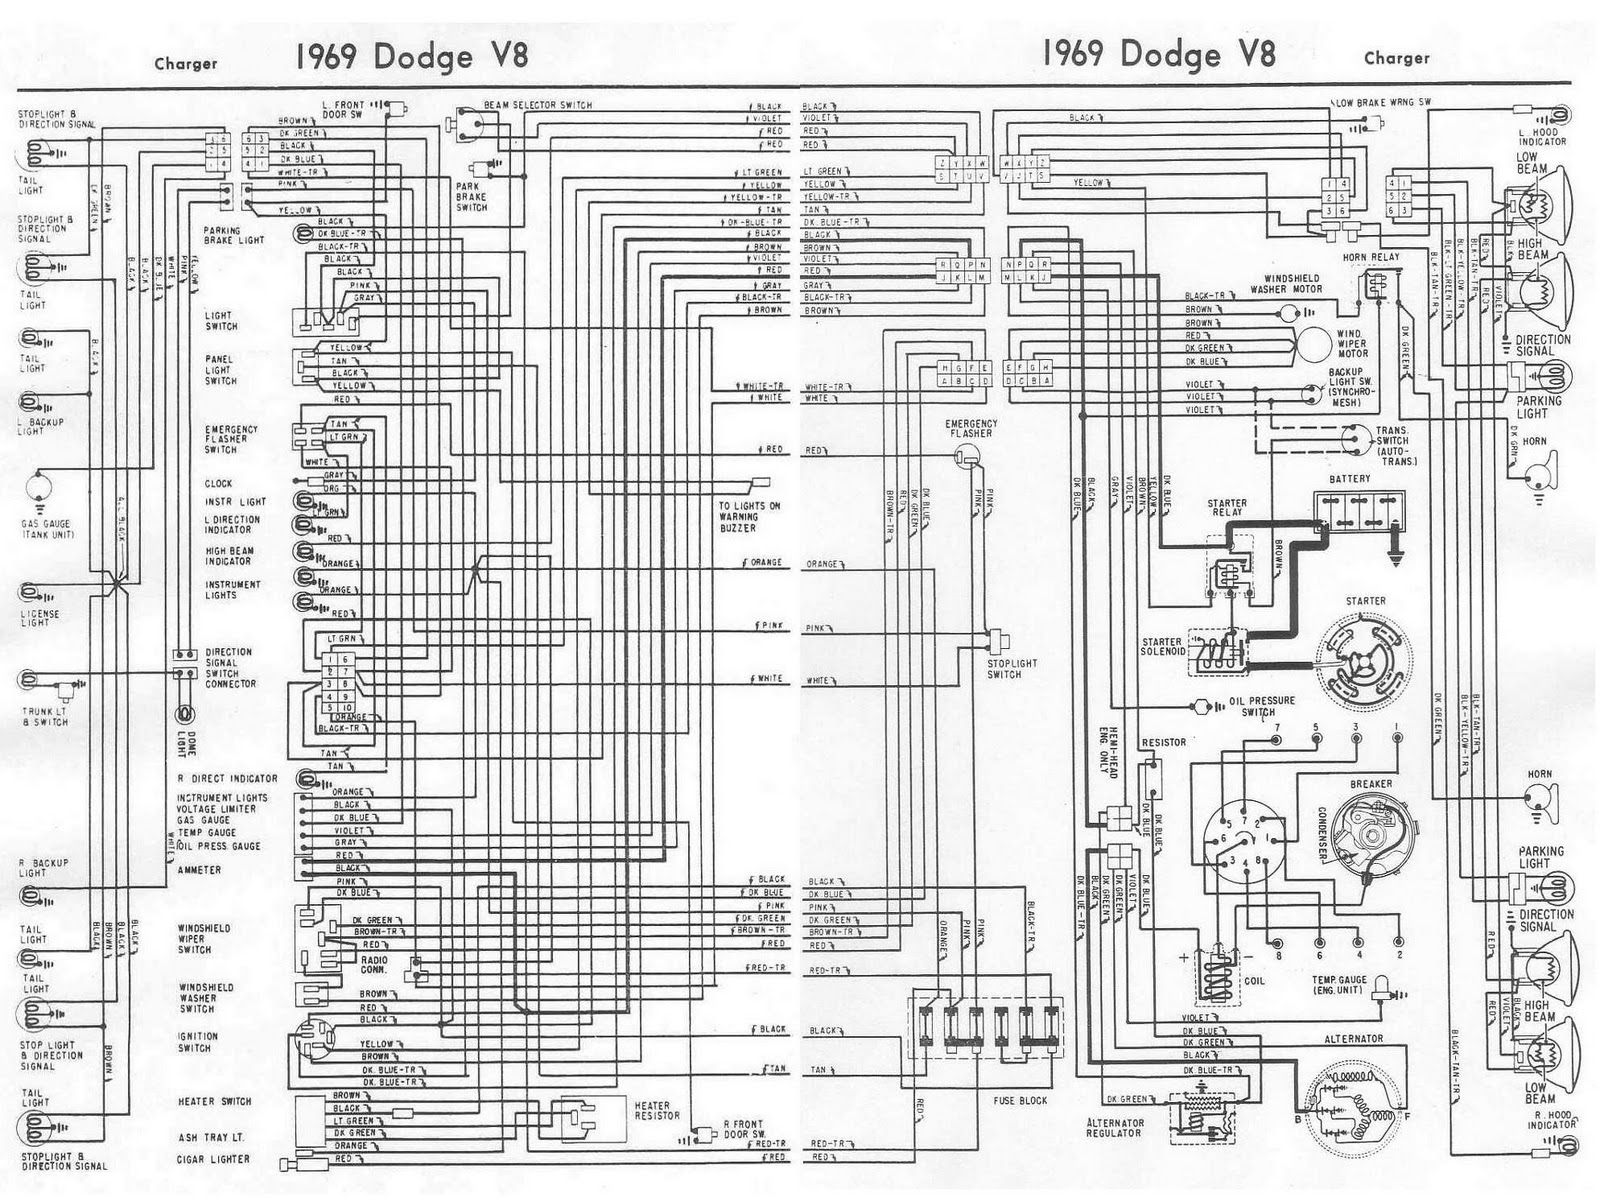 dodge trailer wiring harness diagram 1970 dodge challenger rallye dash color wiring diagram ... dodge challenger wiring harness diagram